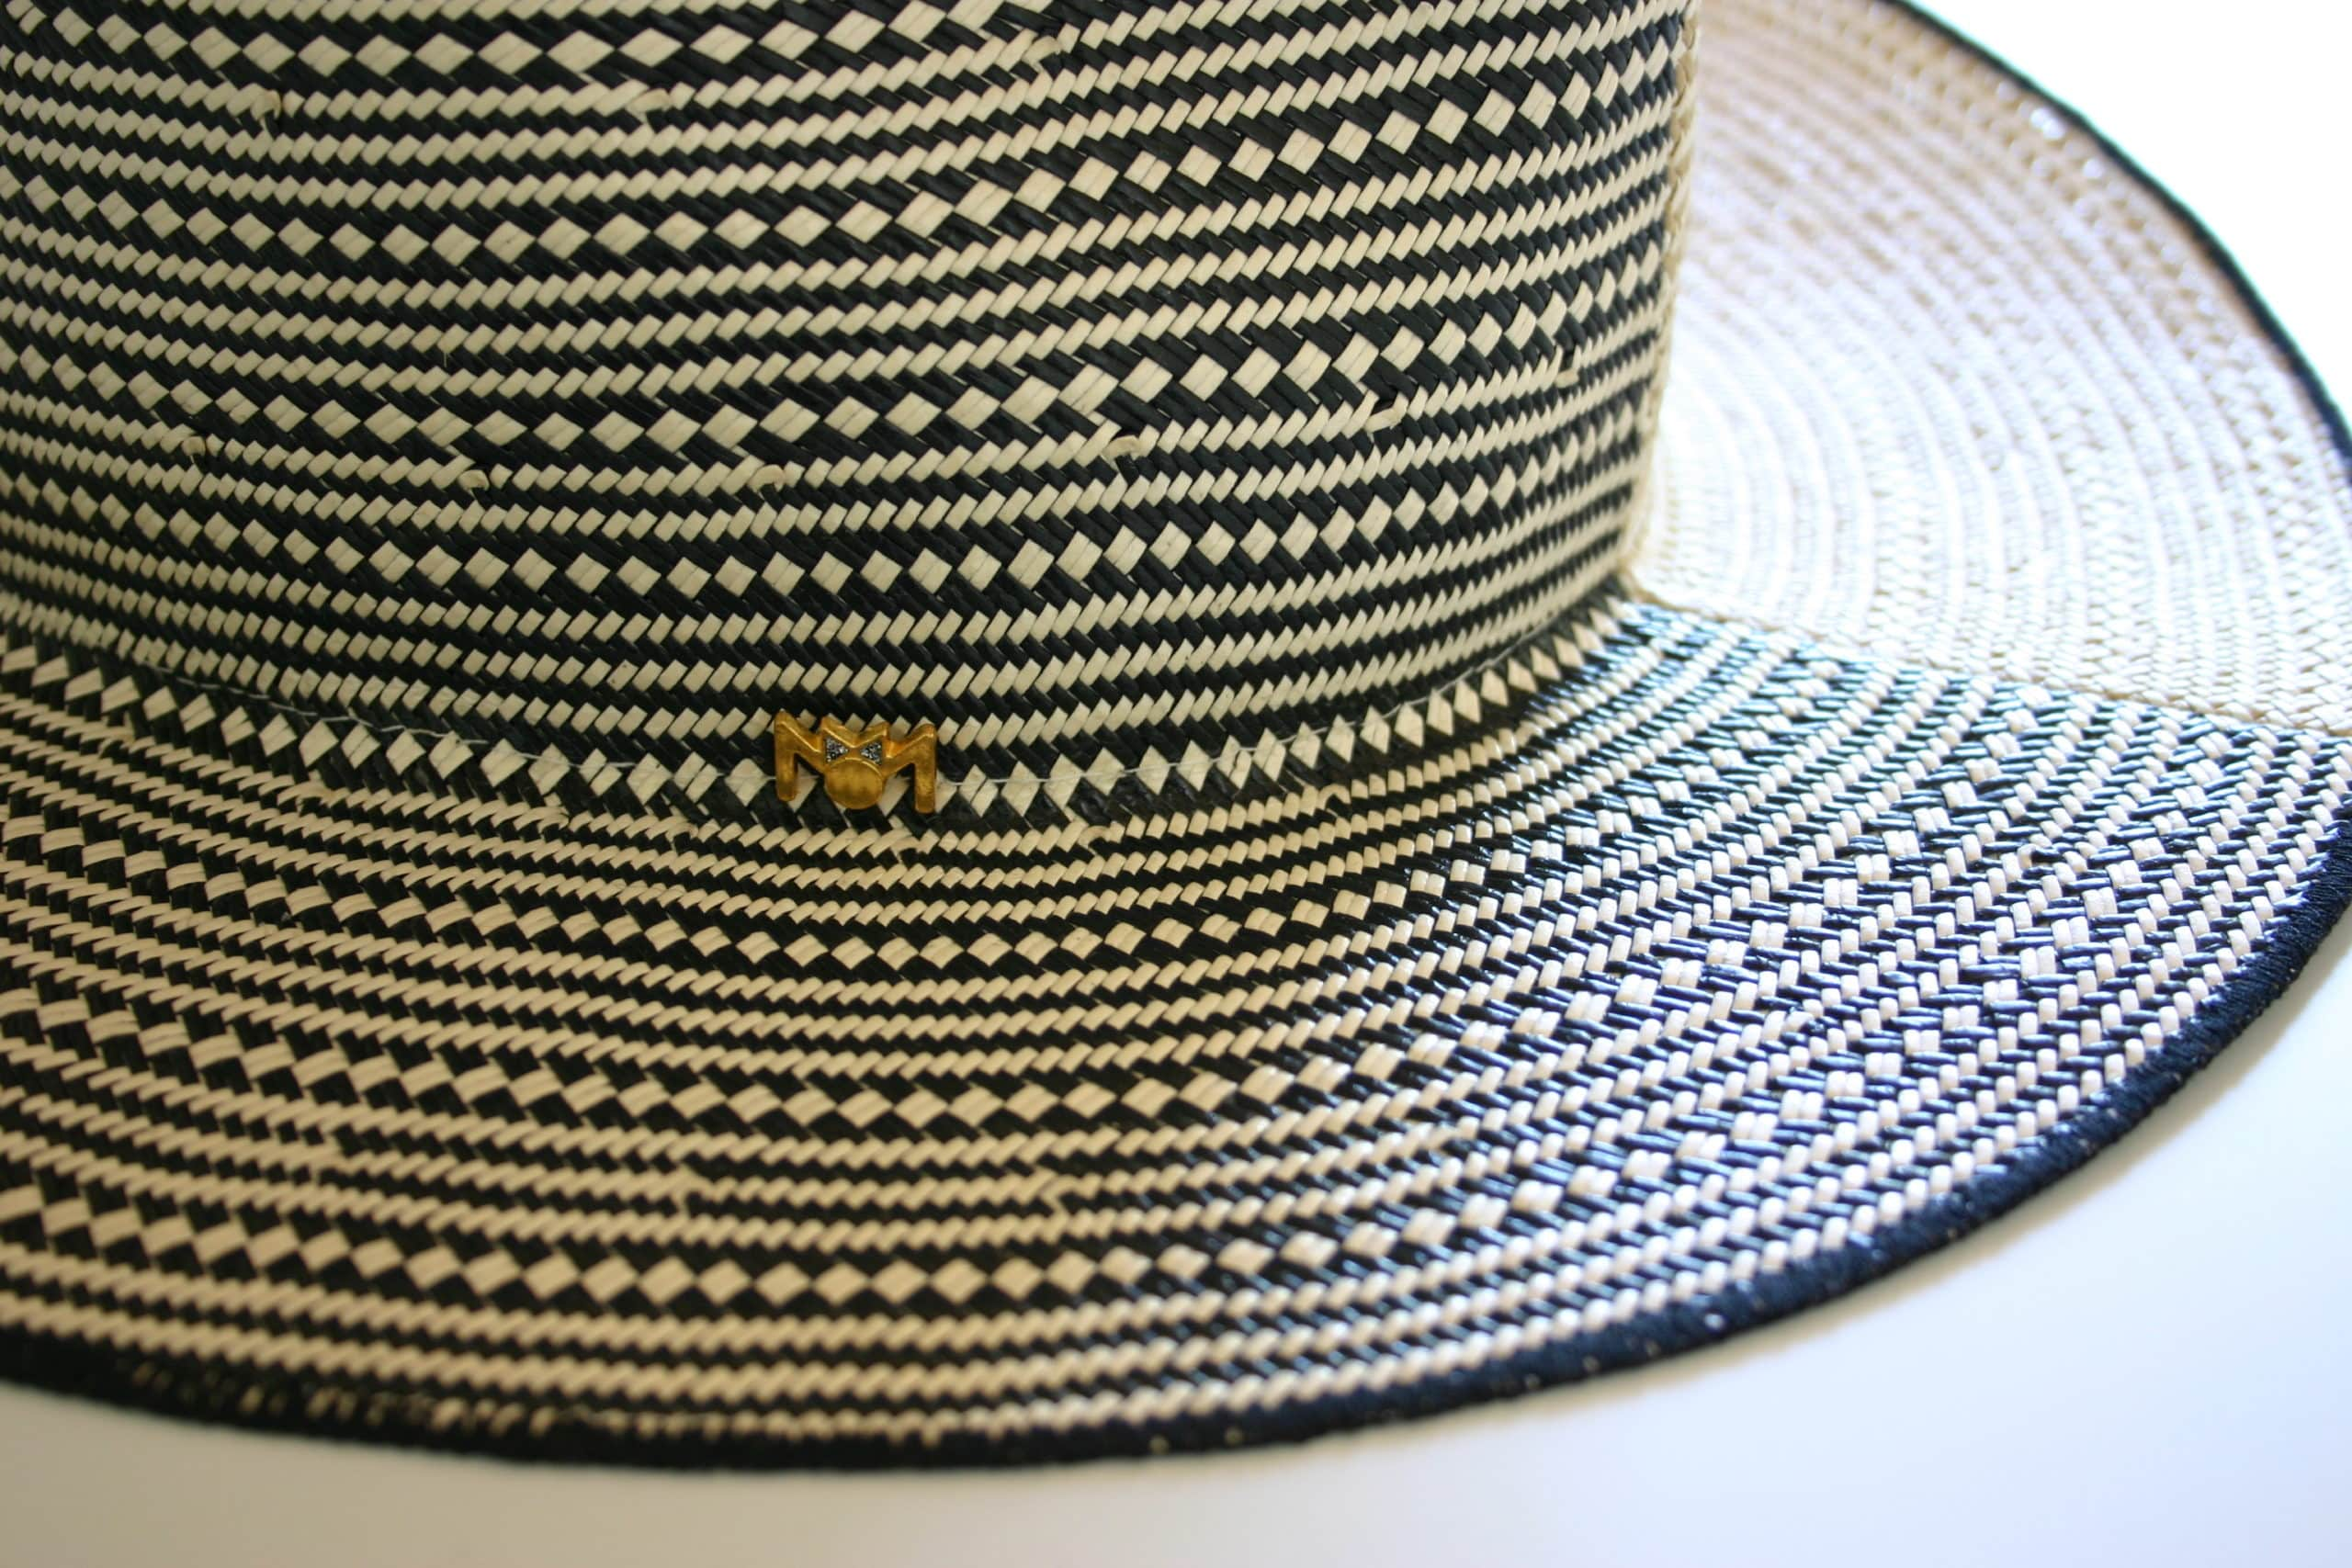 sombrero jack minime paris panama natural hecho a mano gris complementos mujer hombre